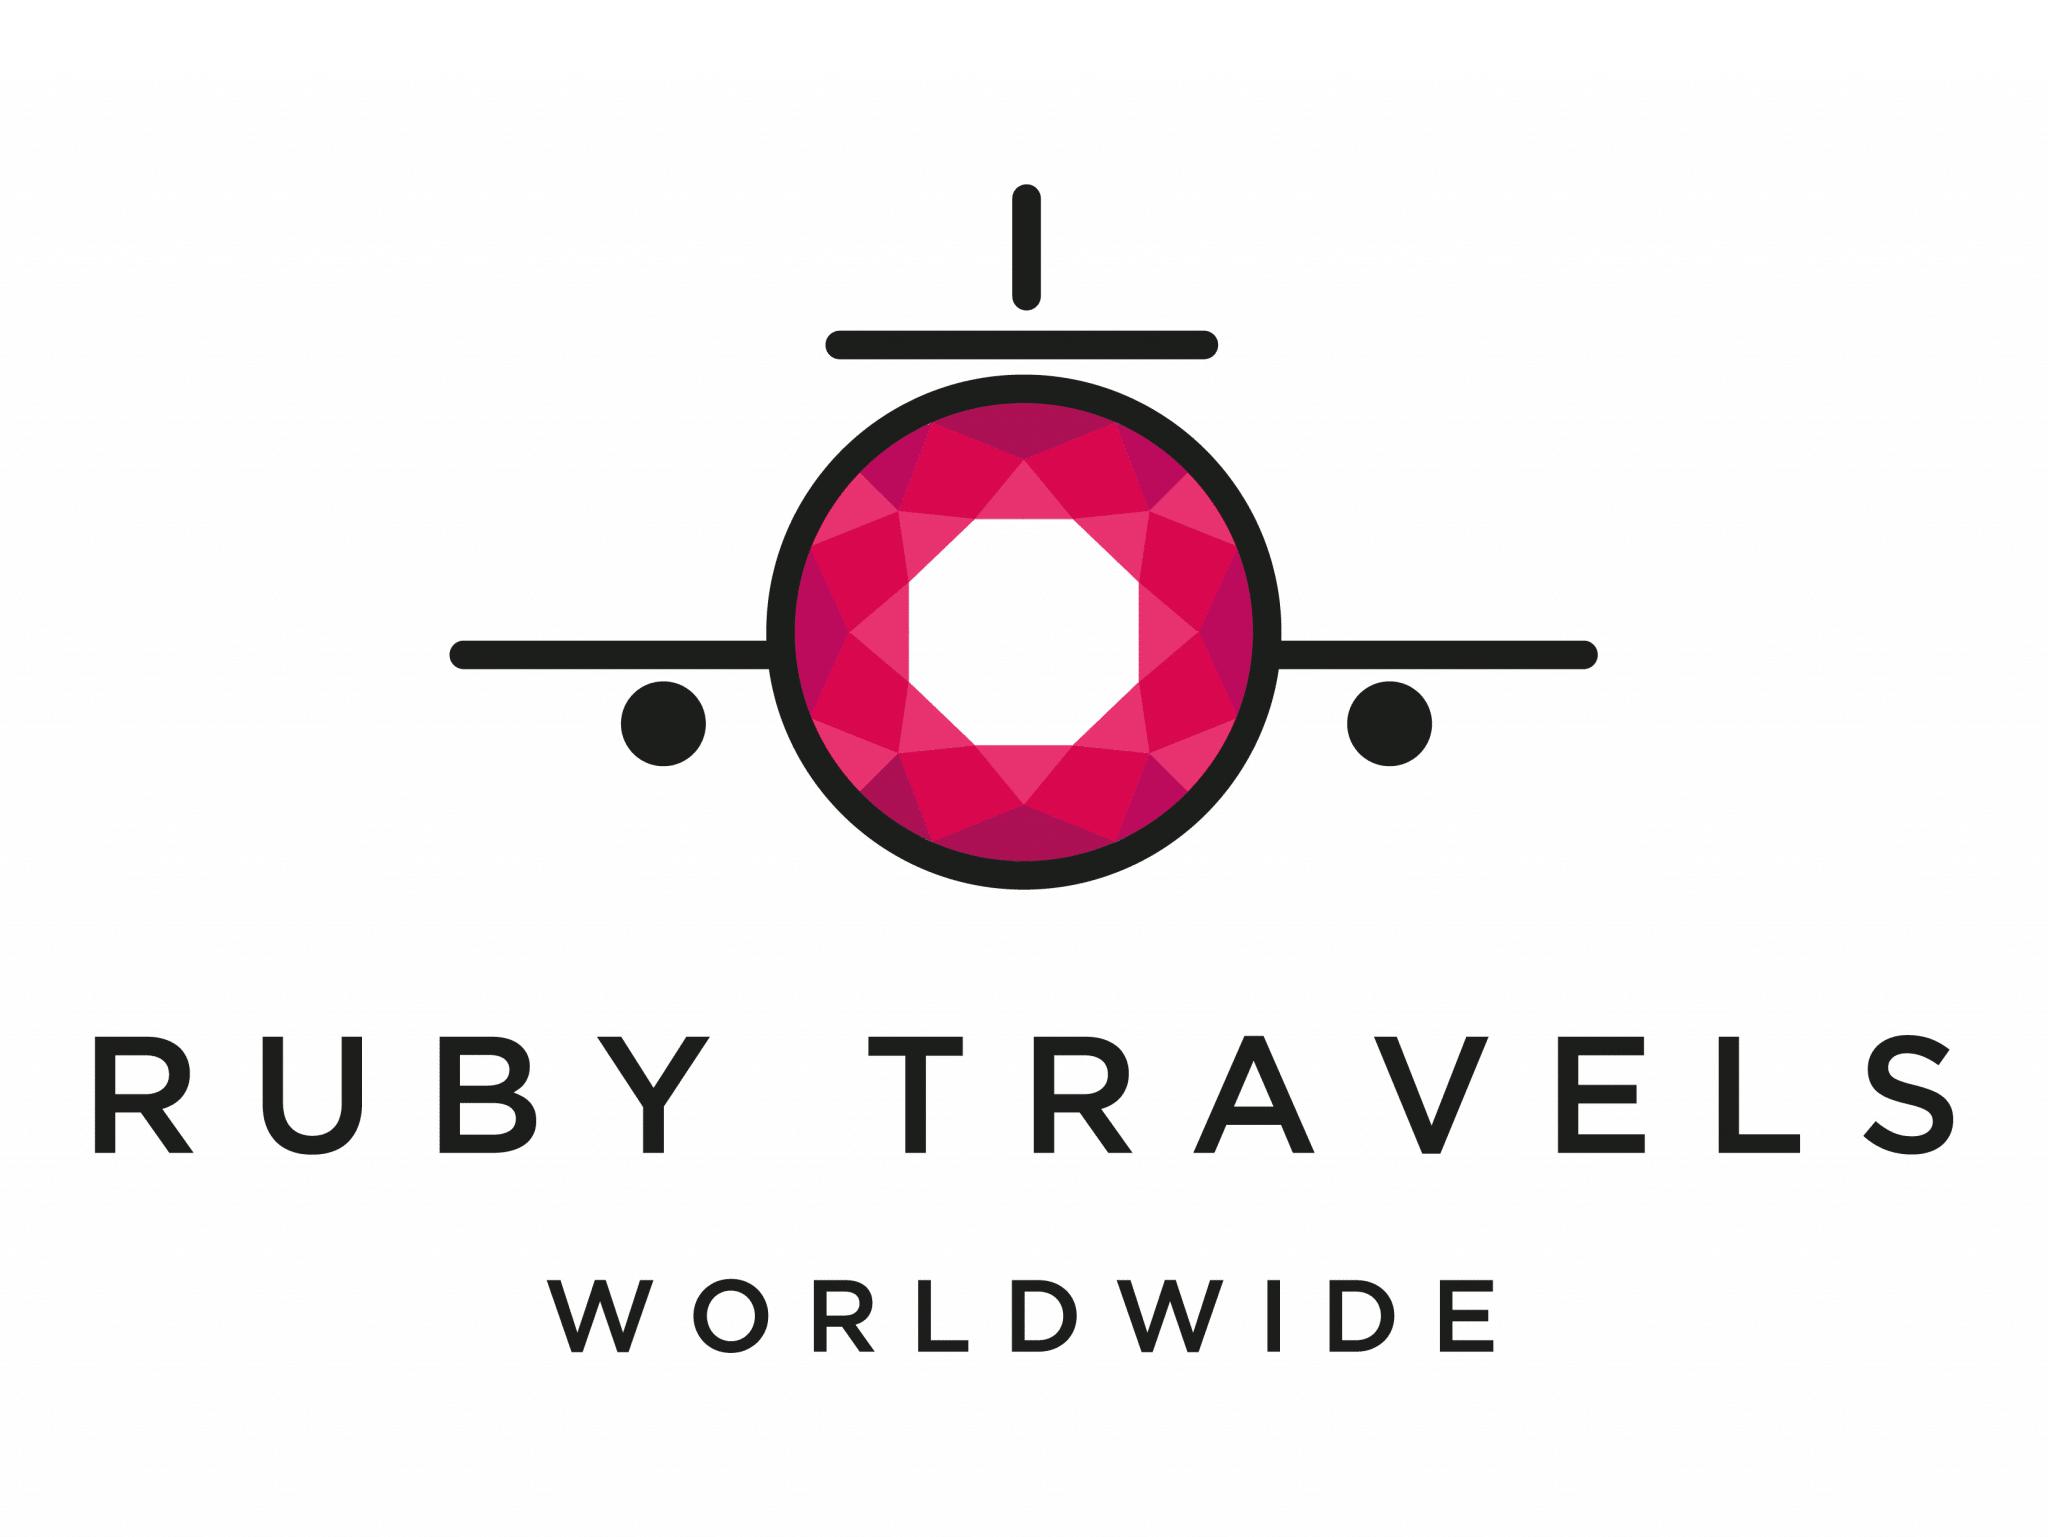 logo-large-ruby-travels